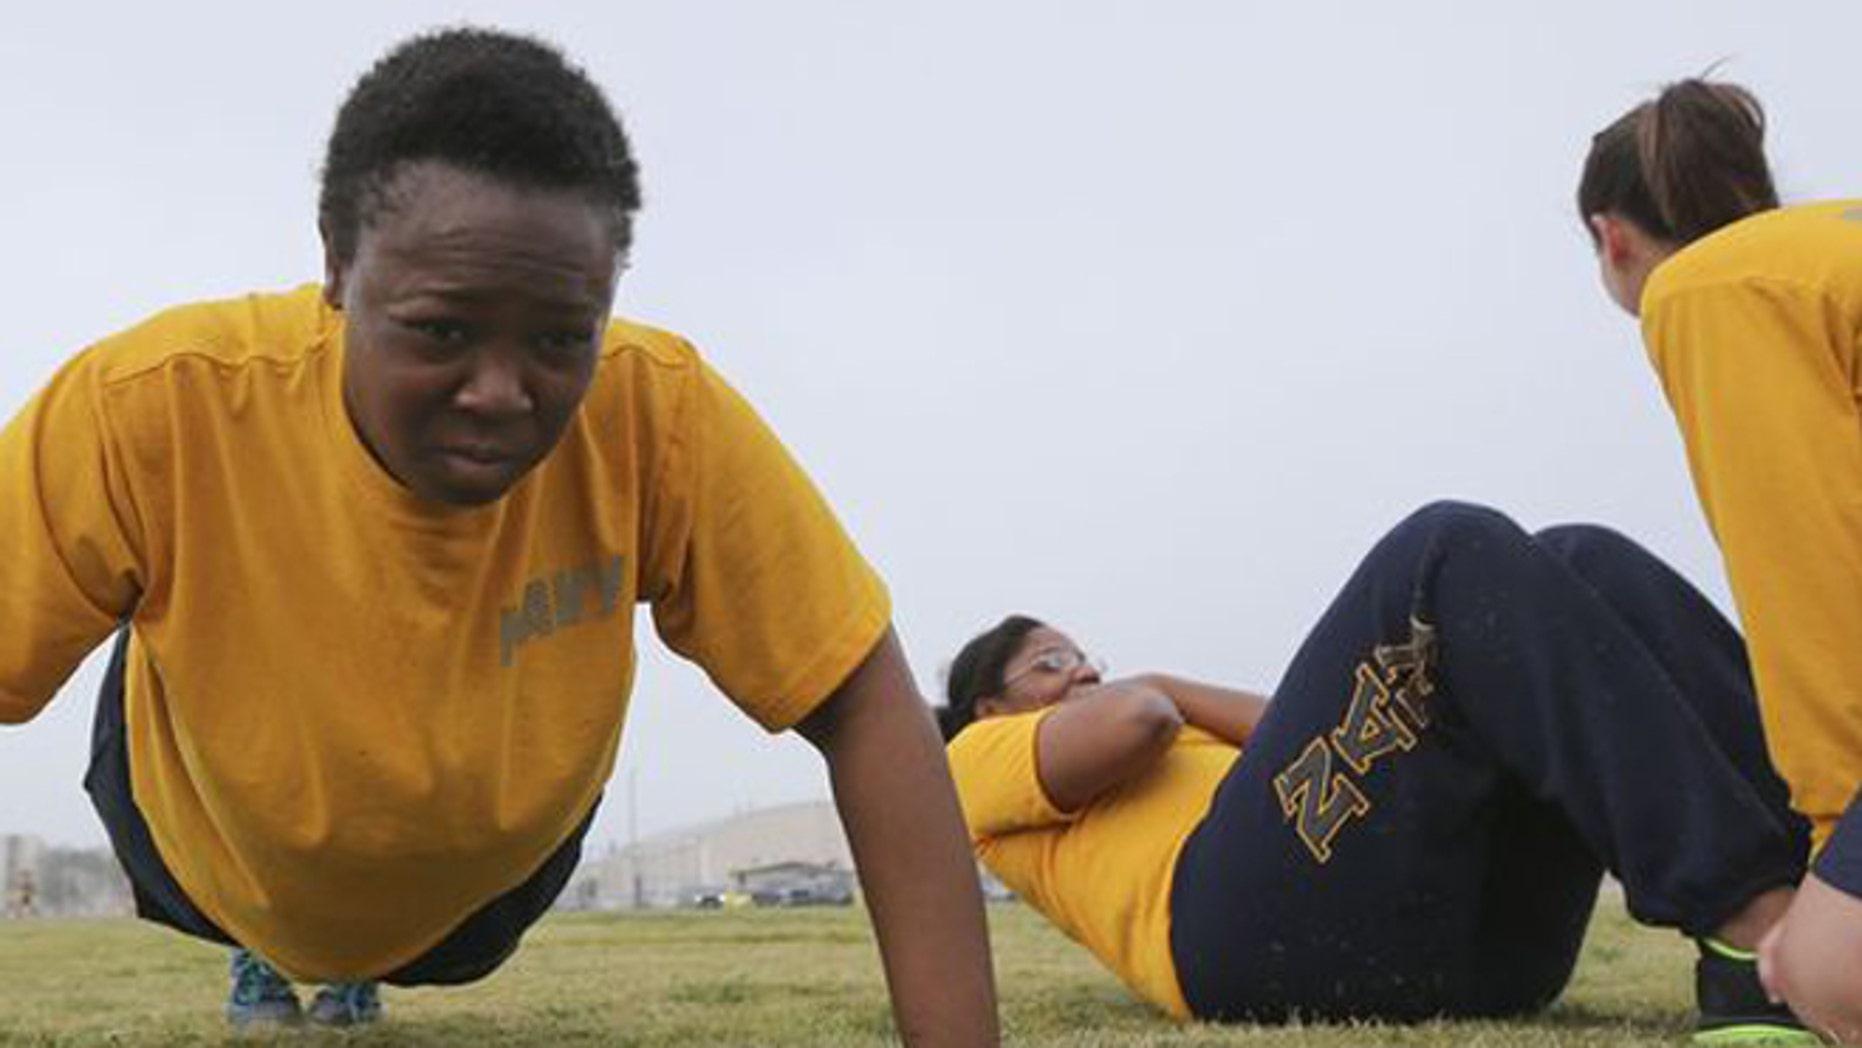 Petty Officer Lentoyi White does pushups while training with fellow Petty Officer Theresa White Monday, Feb. 29, 2016, in Coronado, Calif. (AP Photo/Lenny Ignelzi)